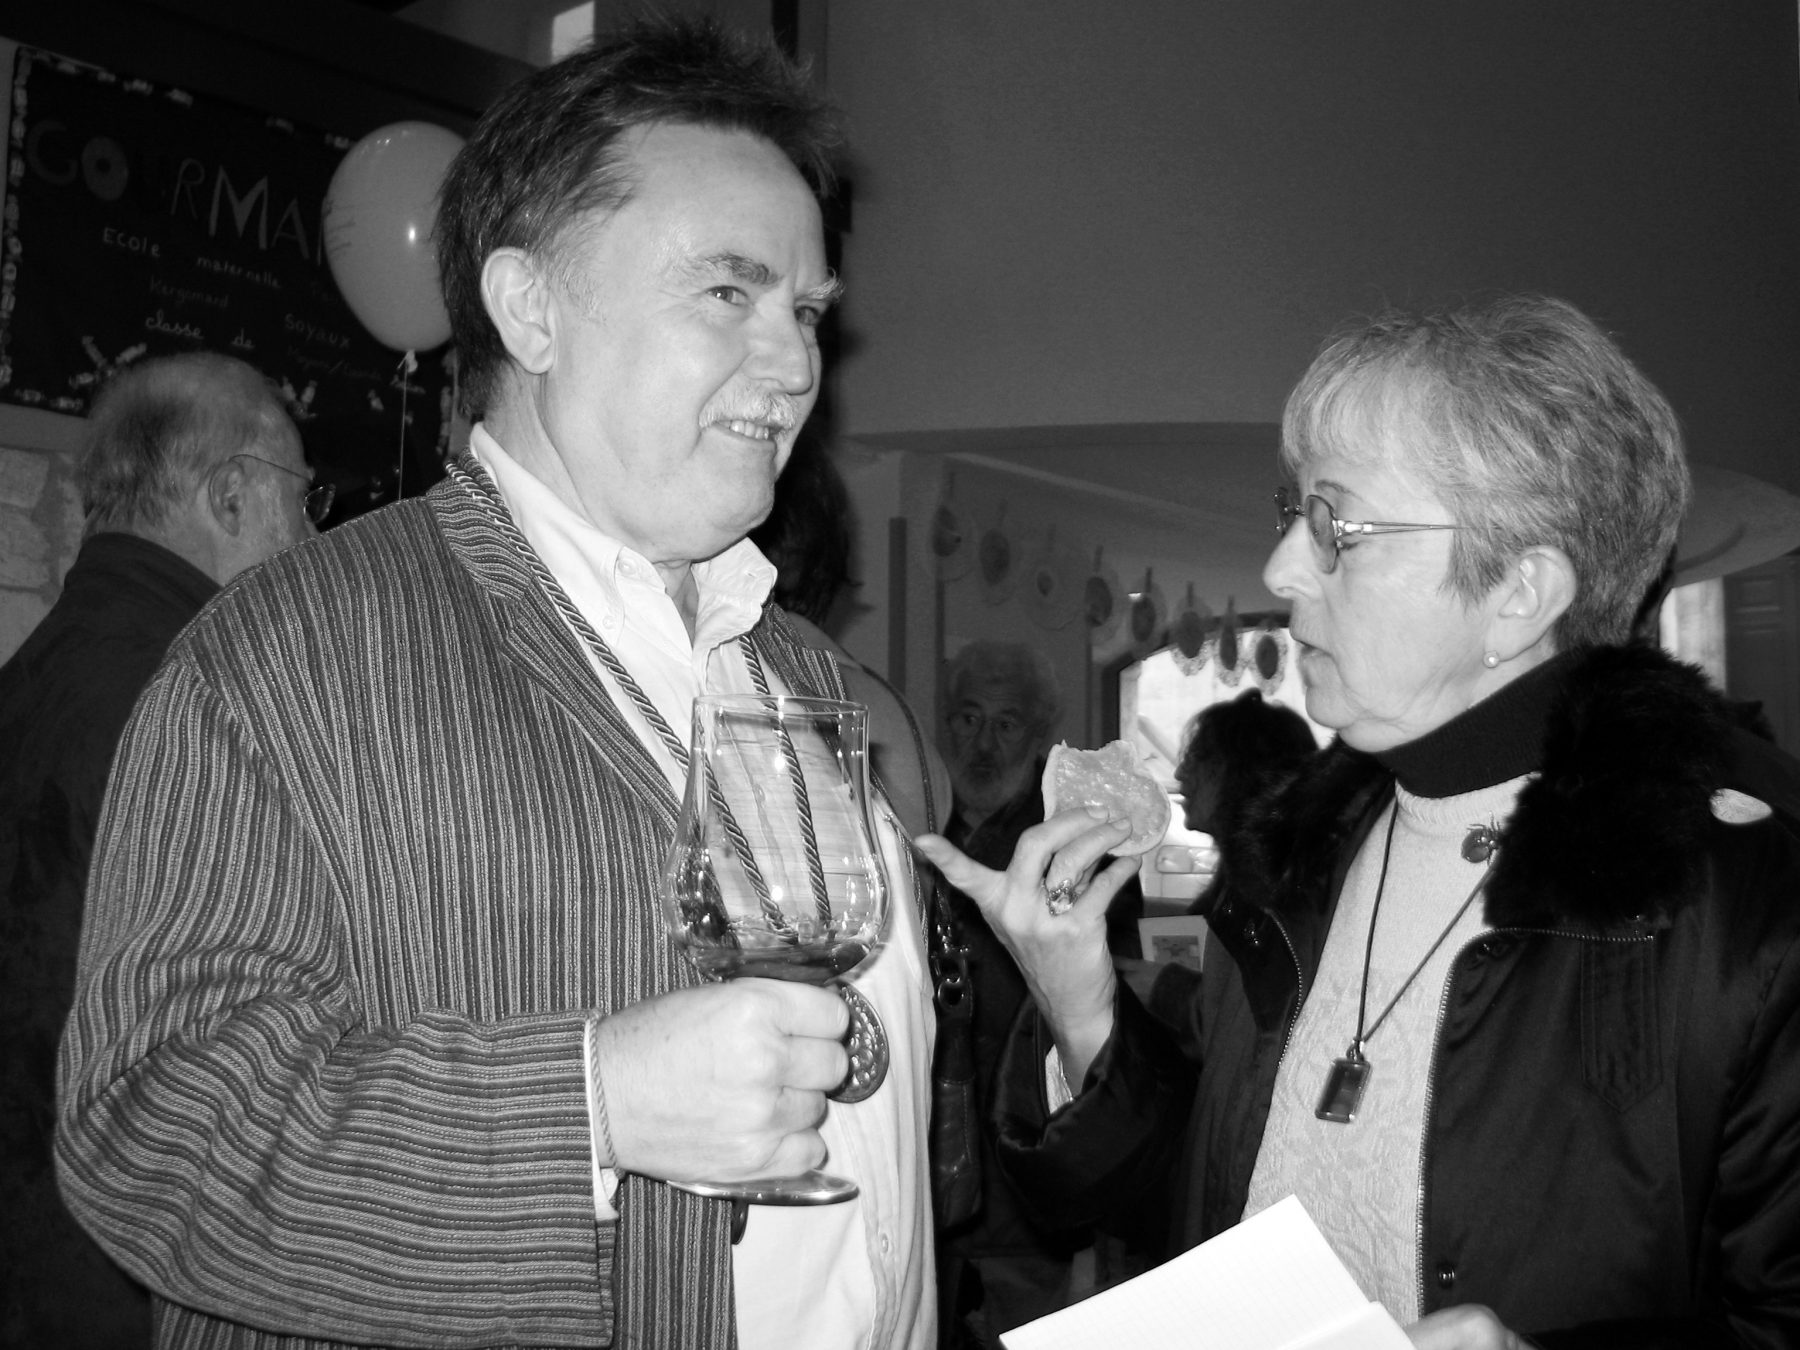 Glen Baxter en 2005 - Photo Alain François